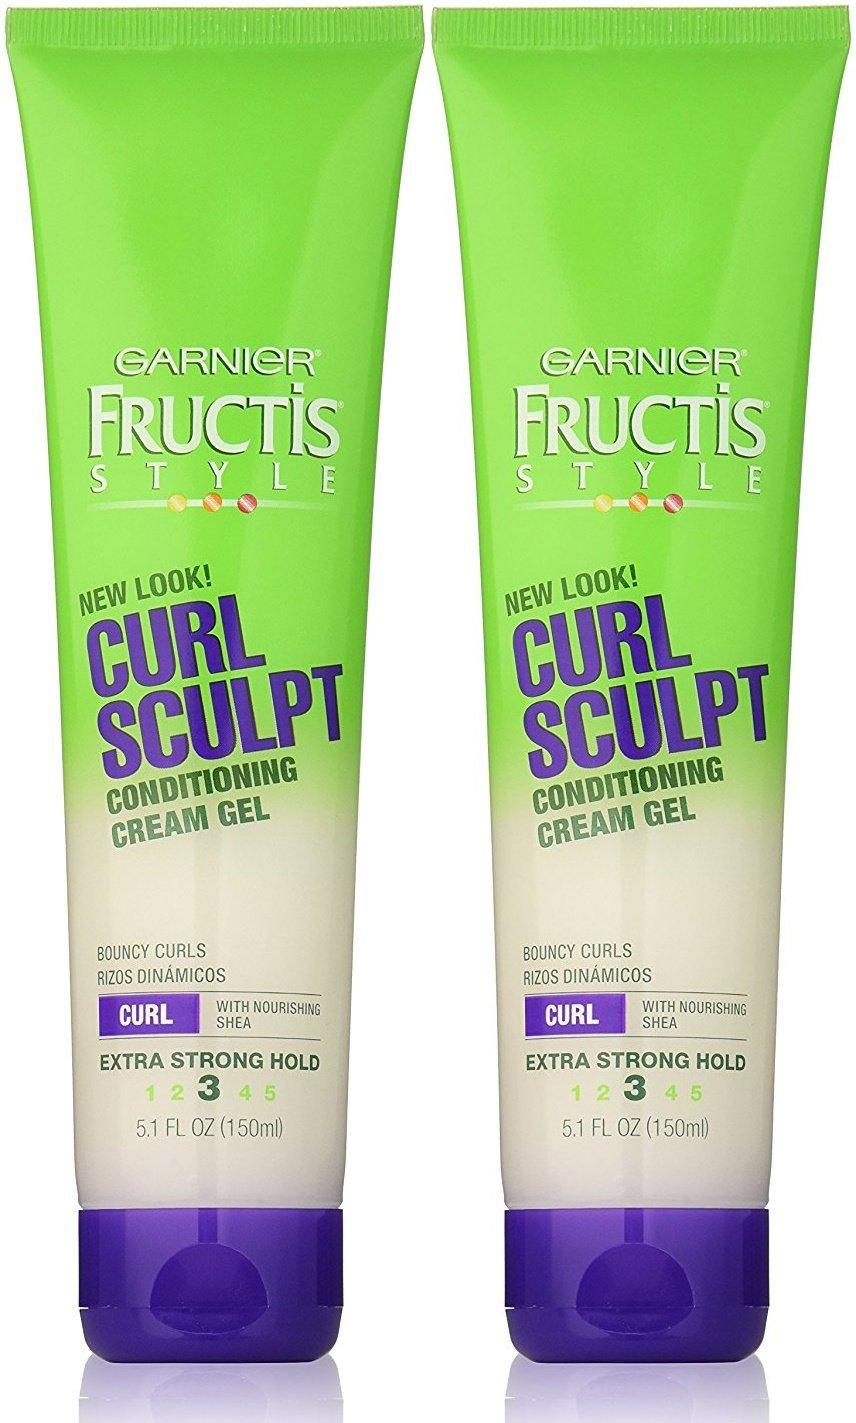 Garnier Fructis Curl Sculpting Cream Gel, Extra Strong Hold, 5 oz, 2 pk